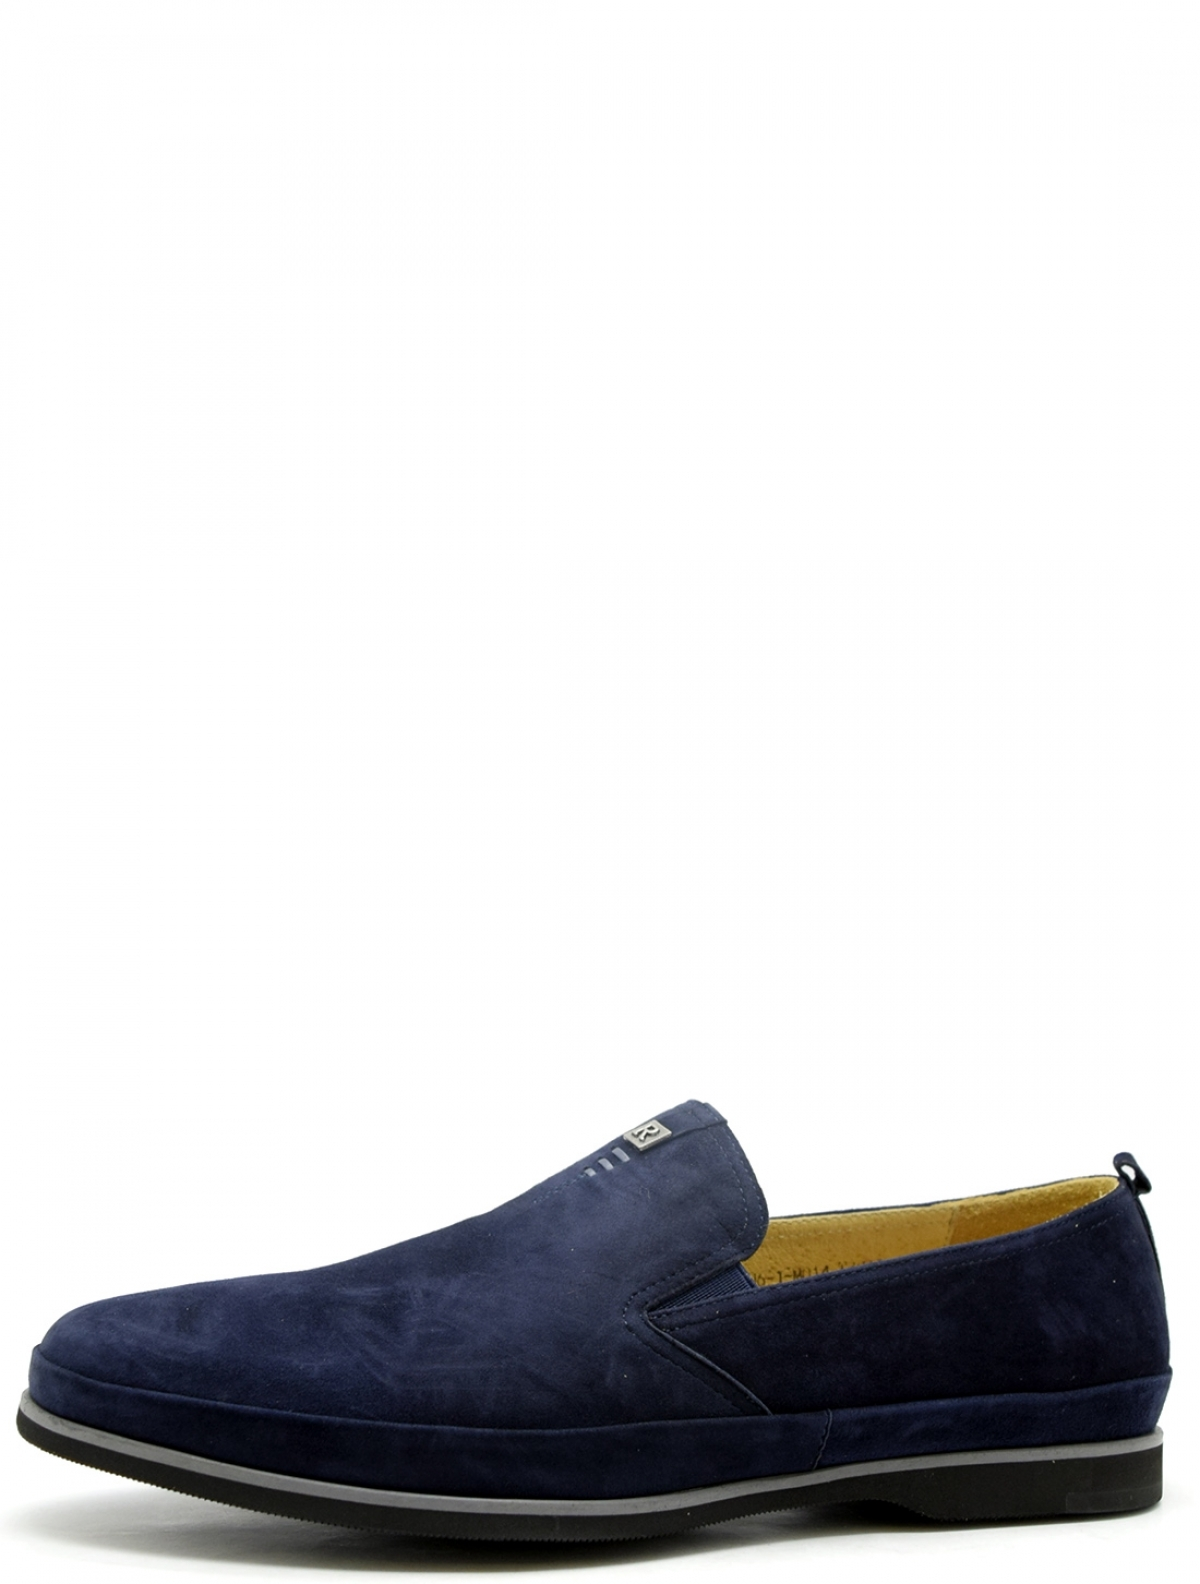 Roscote 7106-1-M014-T2231 мужские туфли